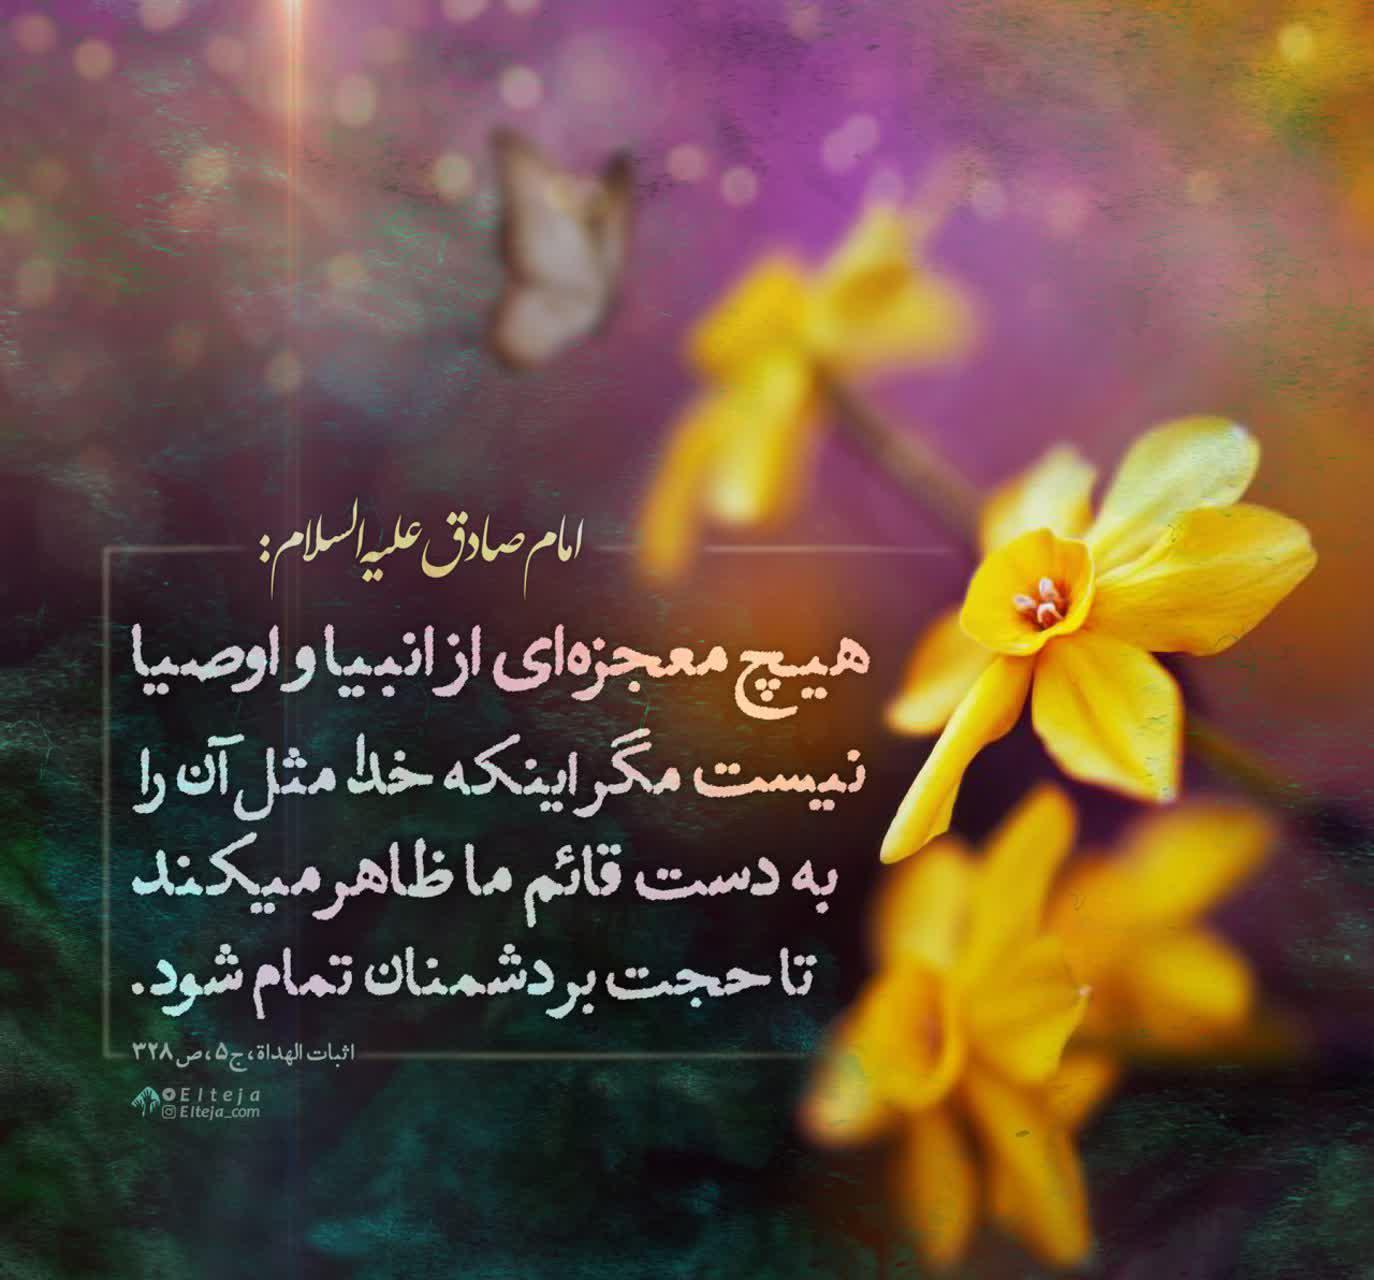 ▫️امام صادق علیه السلام:هیچ معجزه ای